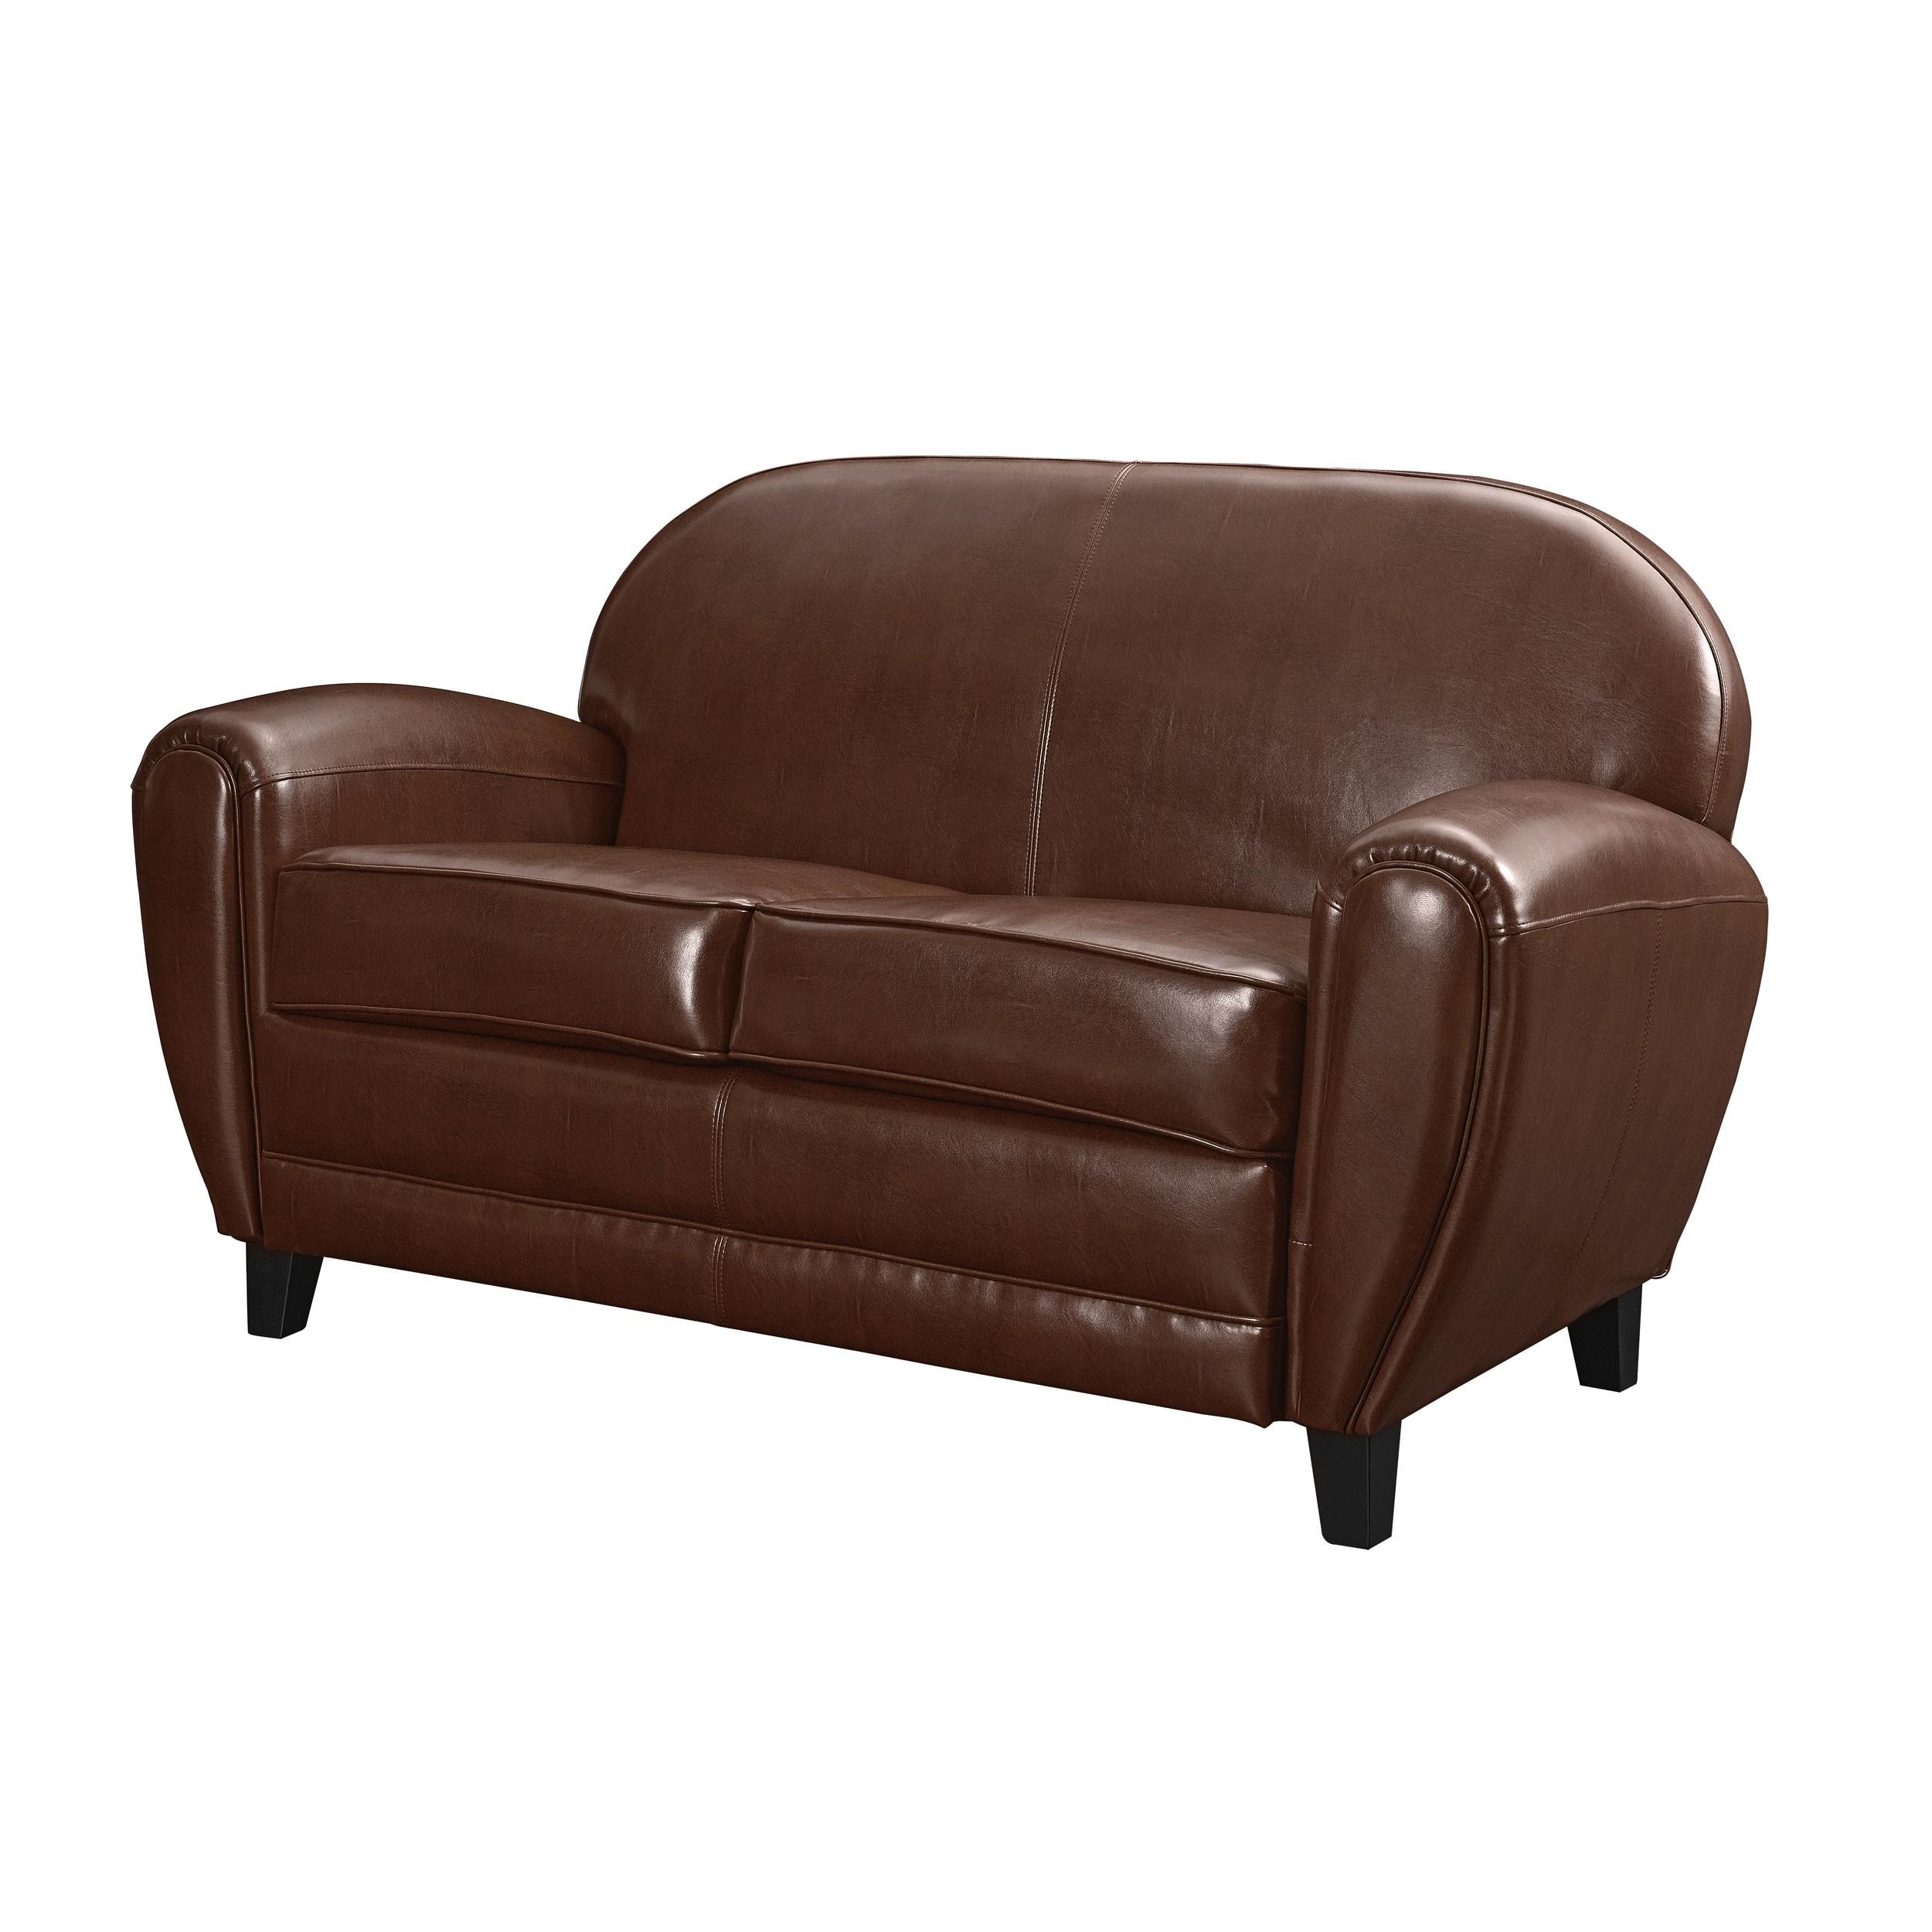 canap club 2 places cuir marron commandez nos canap s. Black Bedroom Furniture Sets. Home Design Ideas